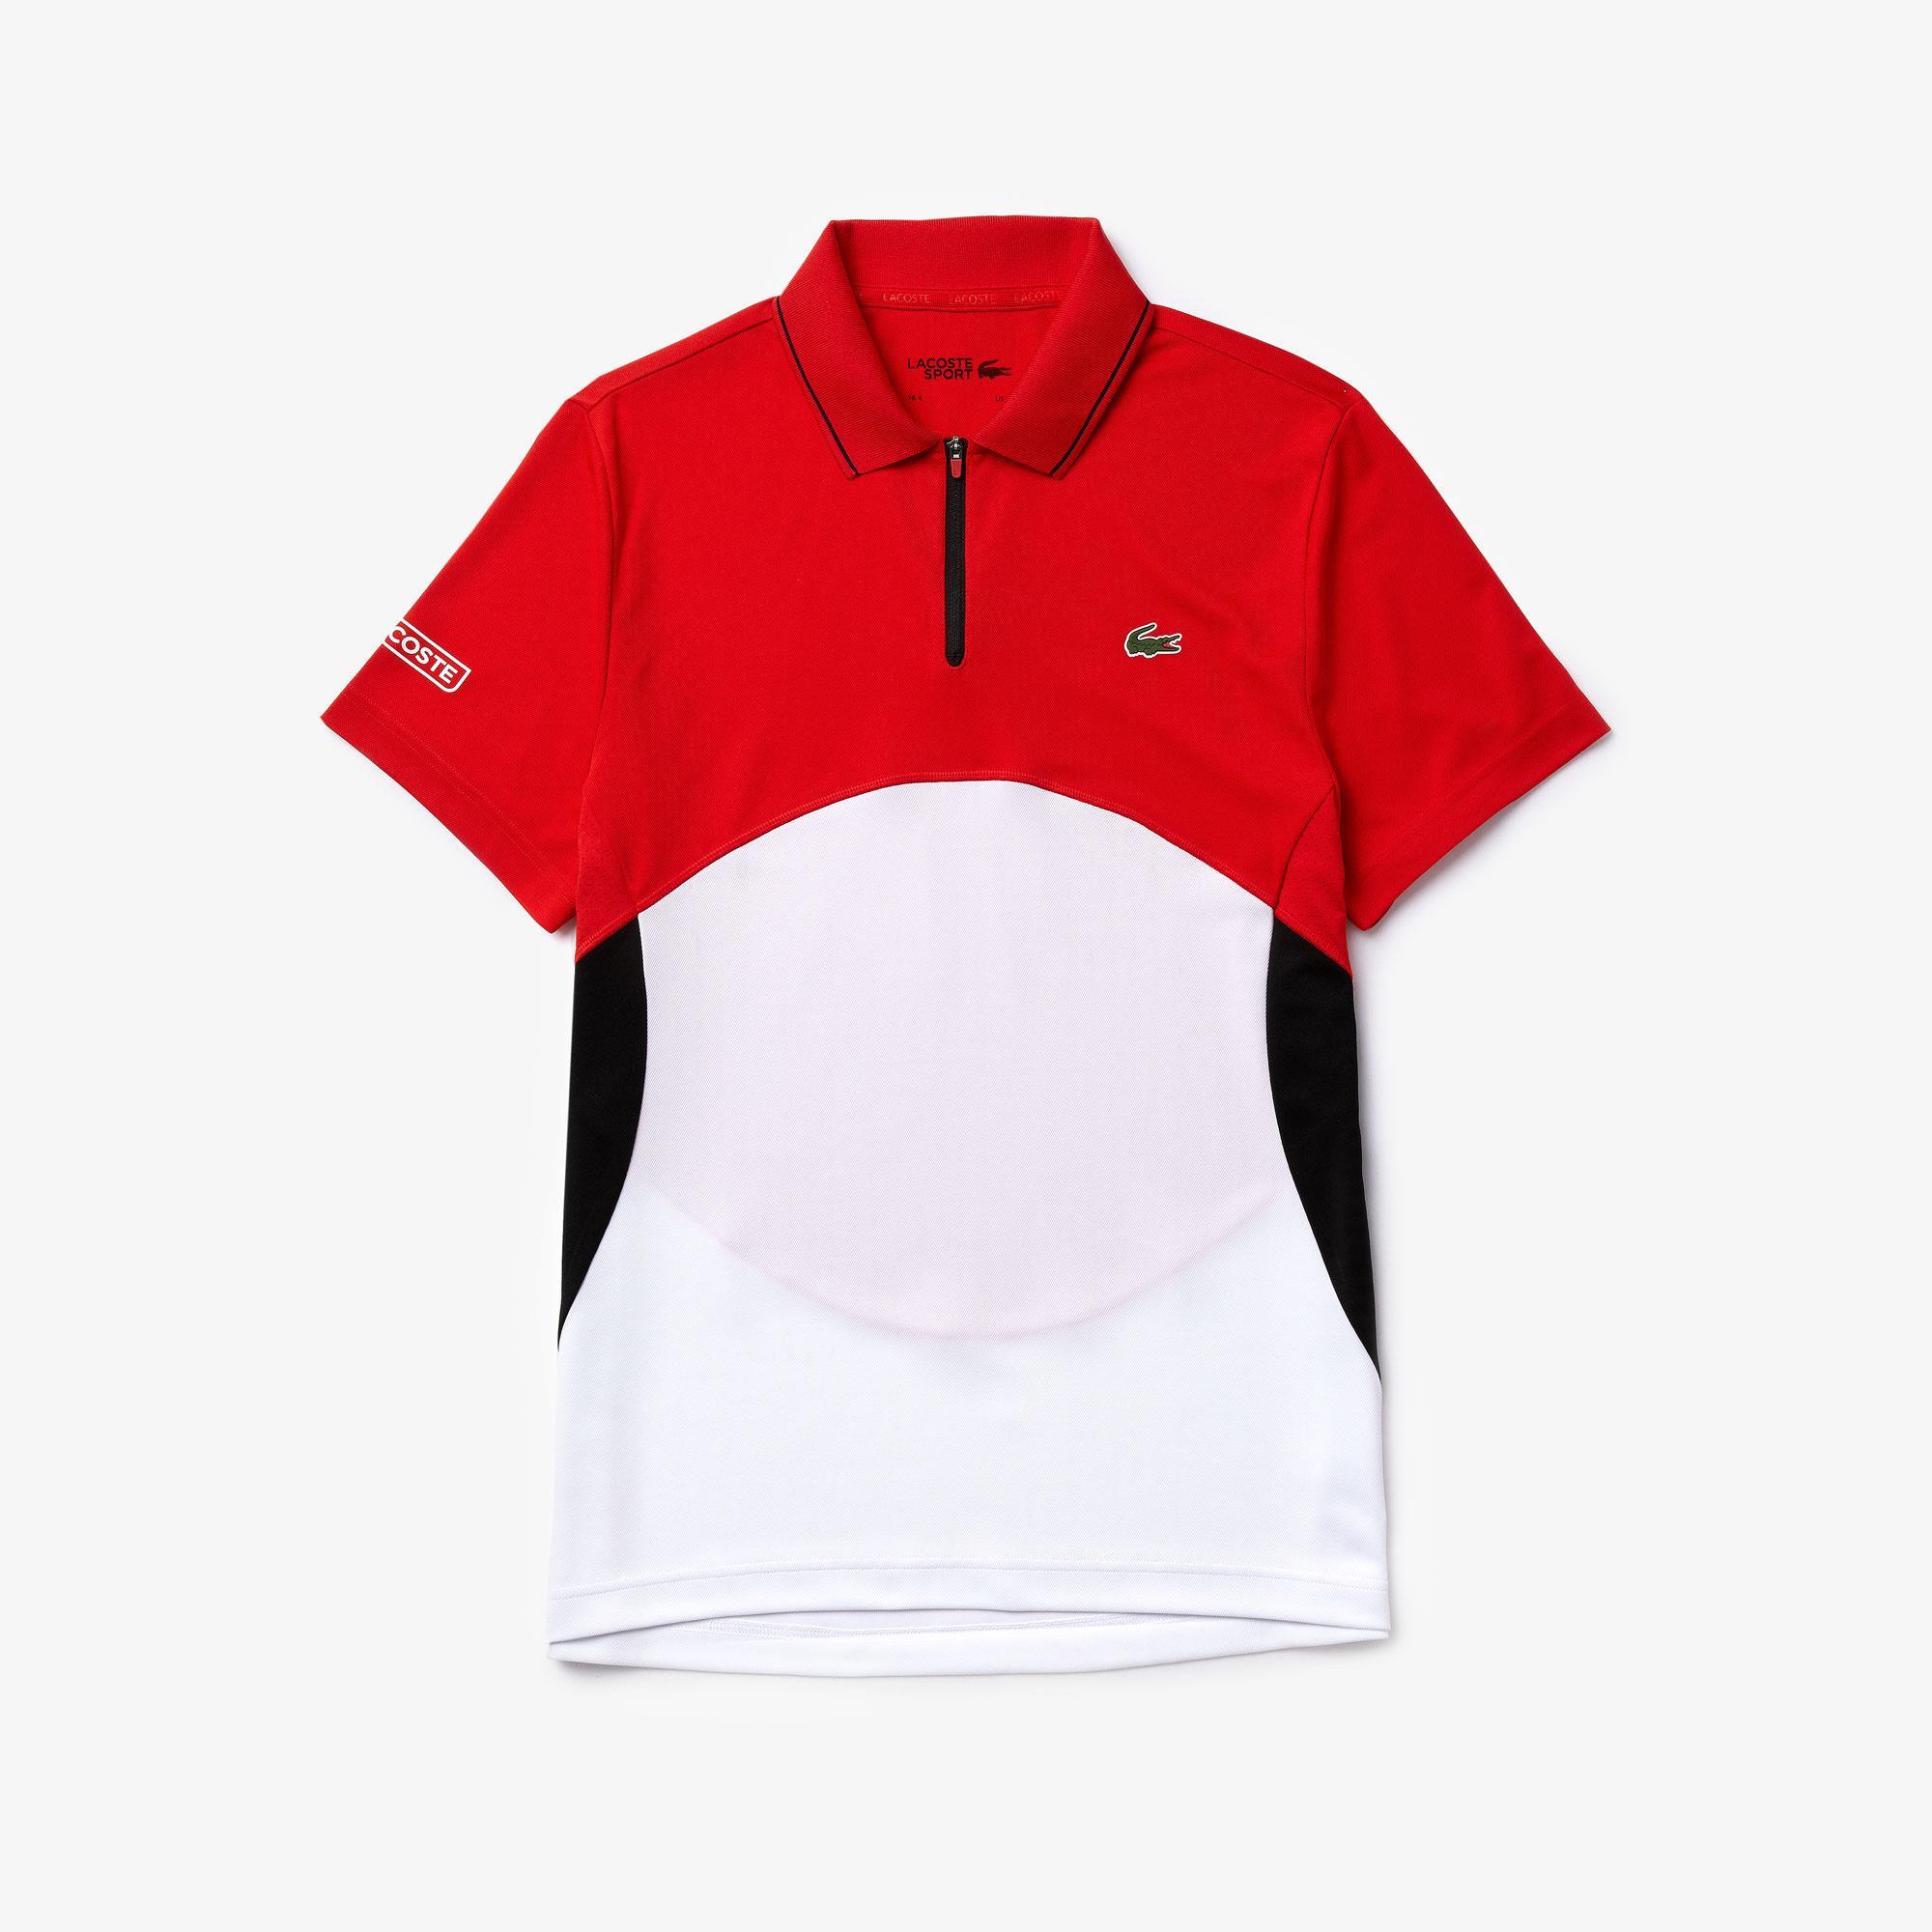 Lacoste Men's Sport Ultra-Dry Piqué Zip Tennis Polo